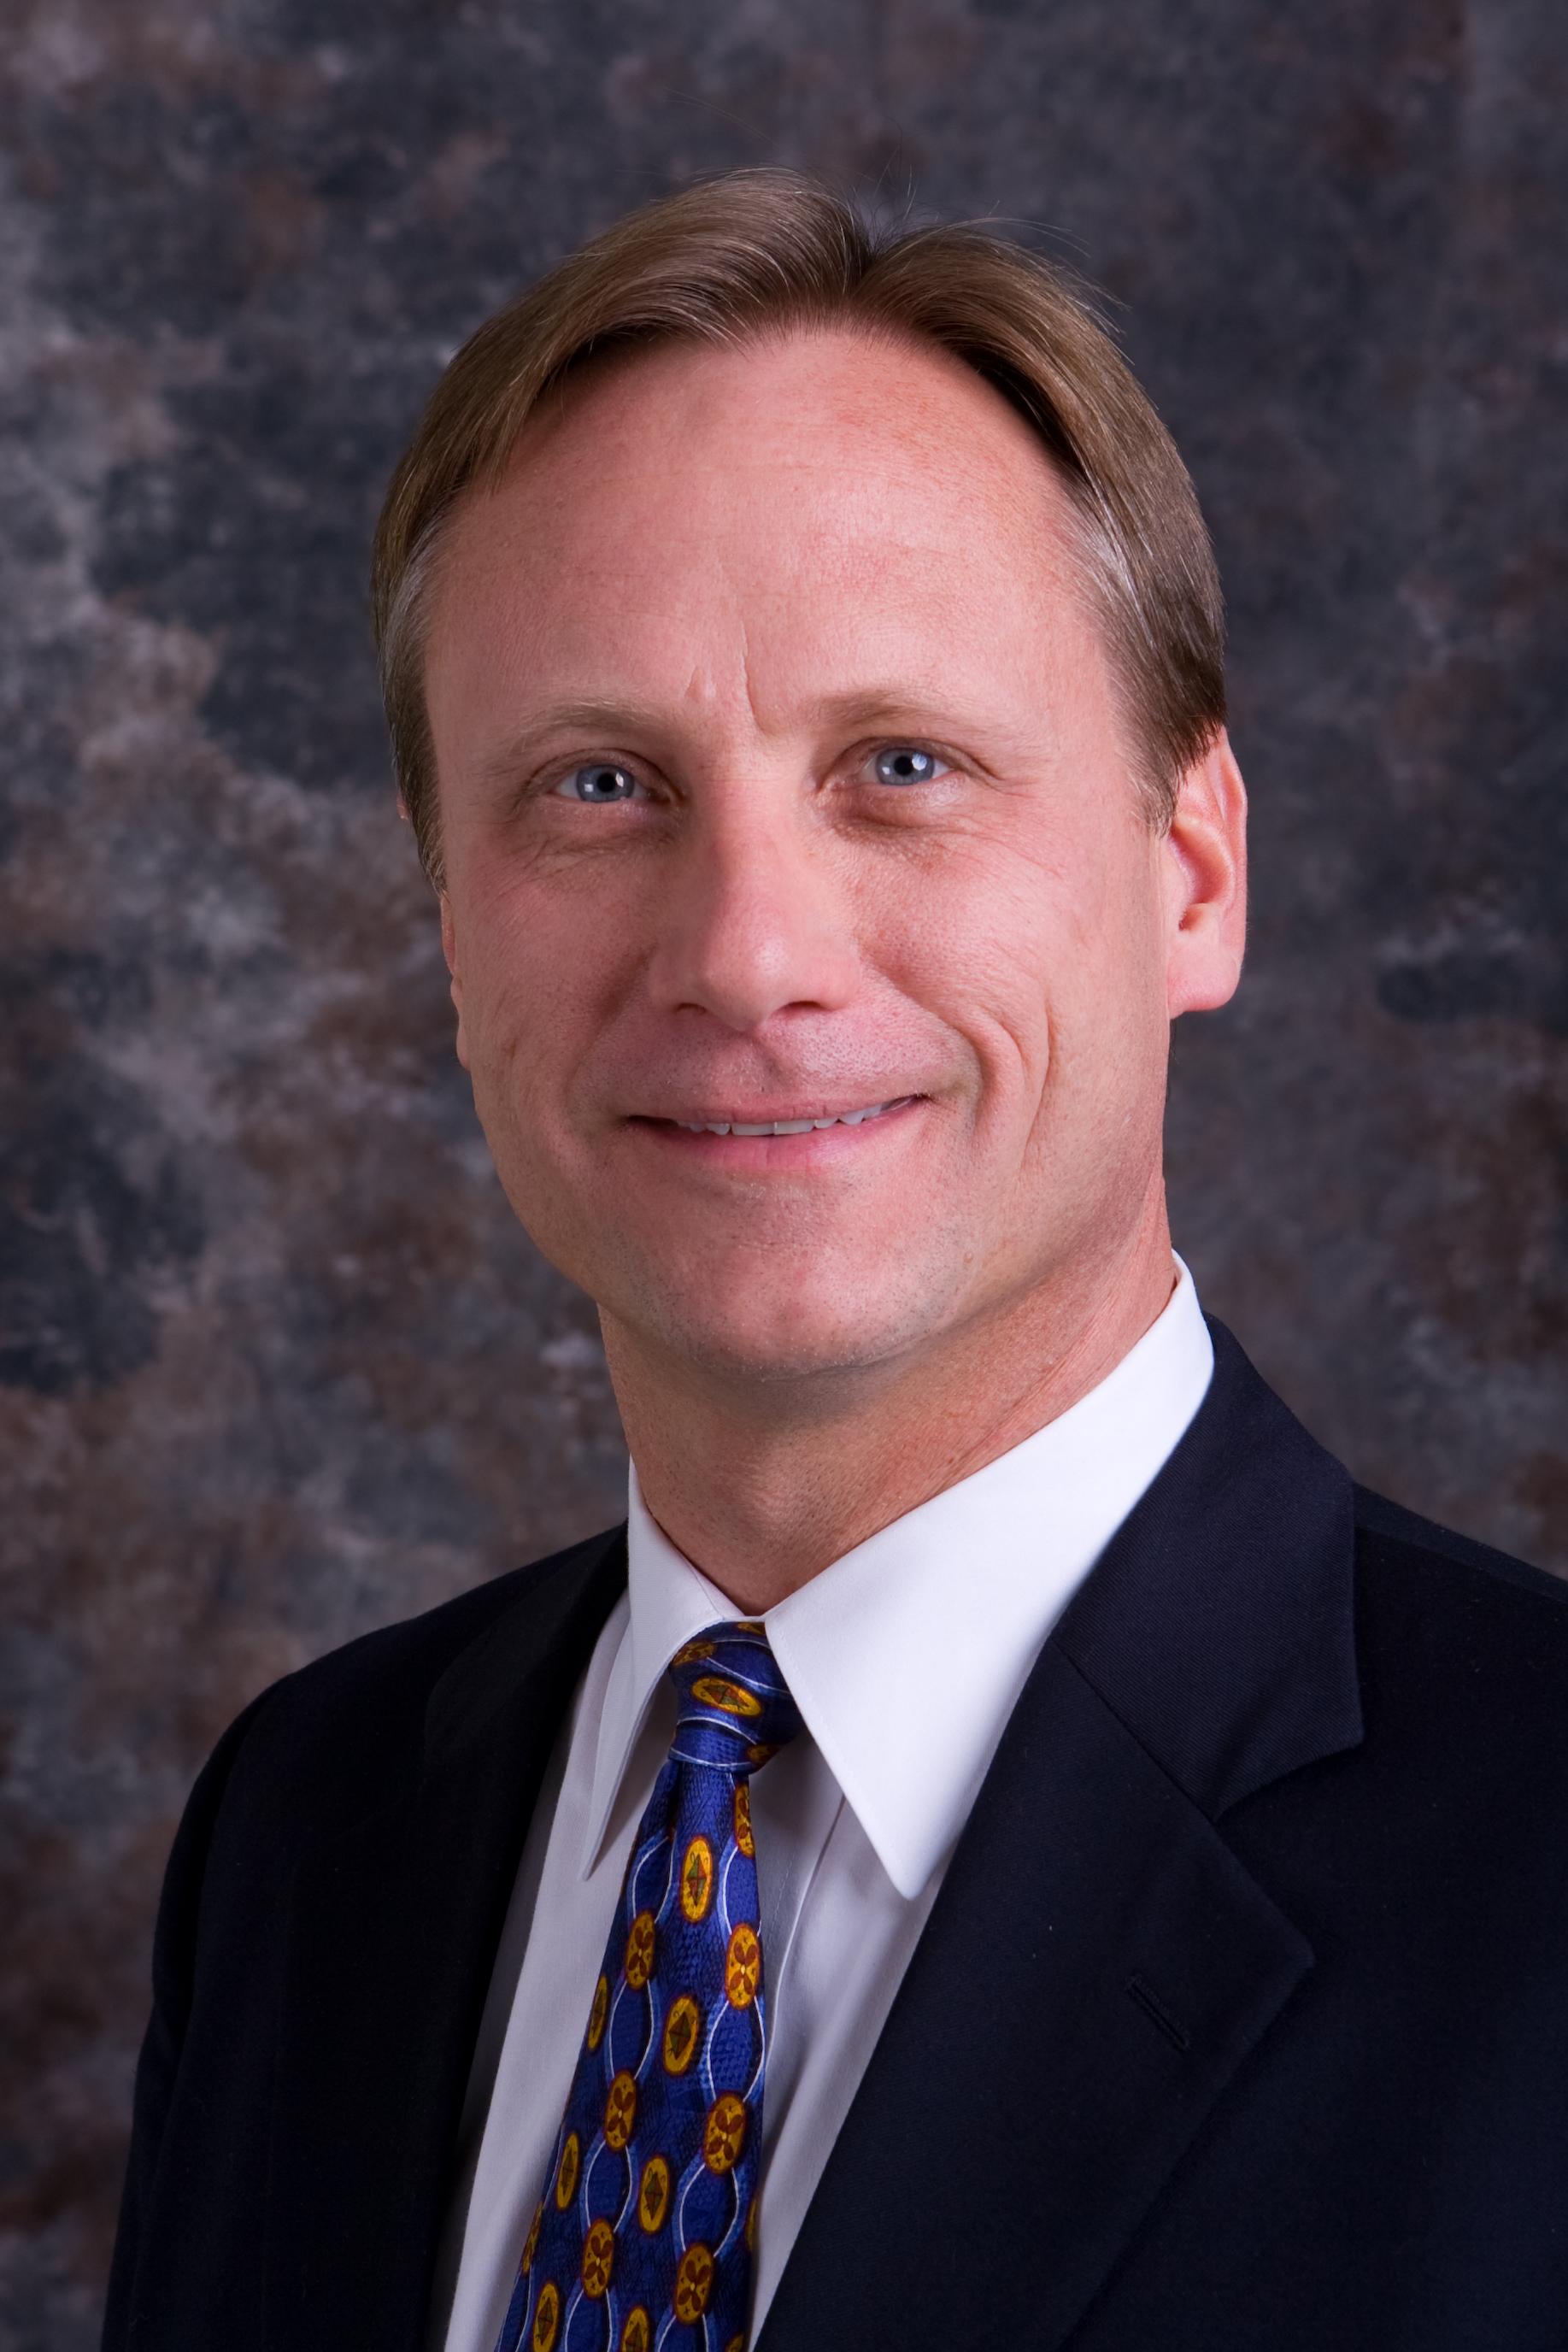 David Caldwell Net Worth